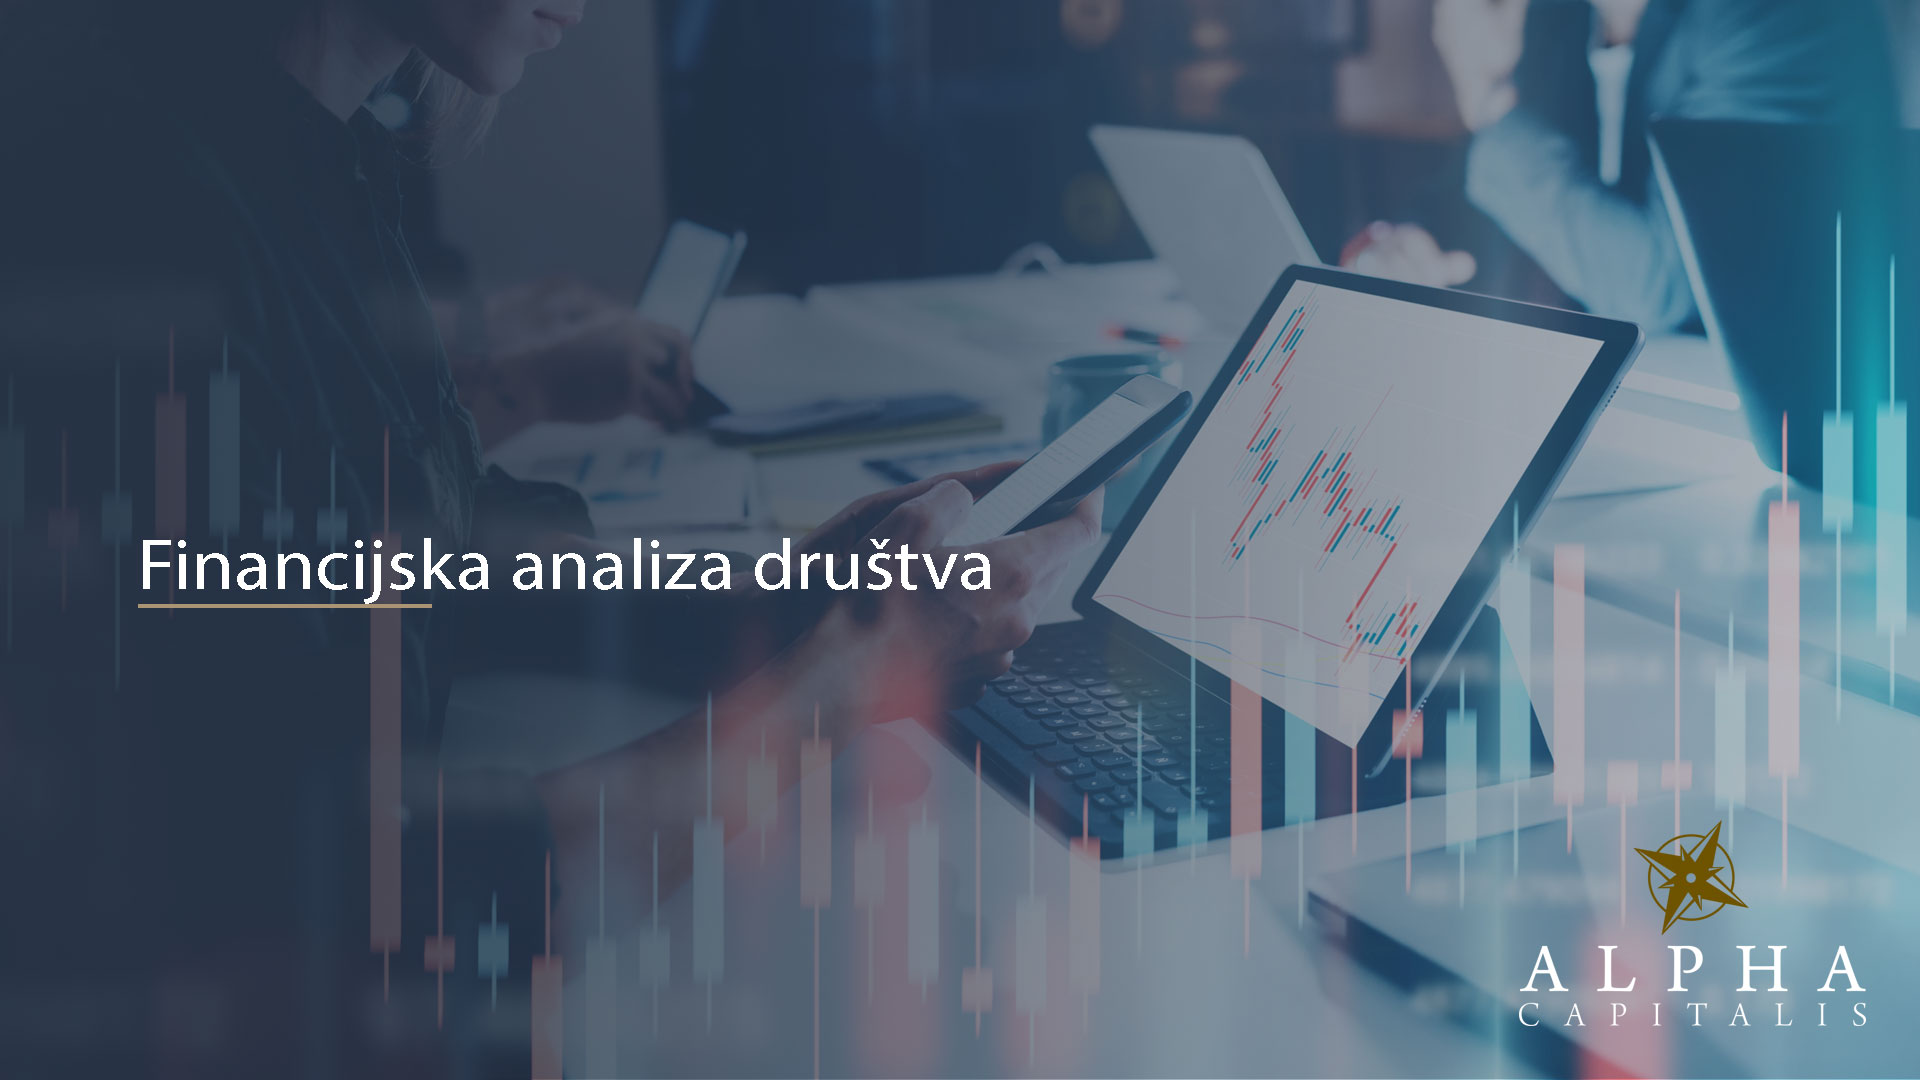 alpha-capitalis-financijska-analiza